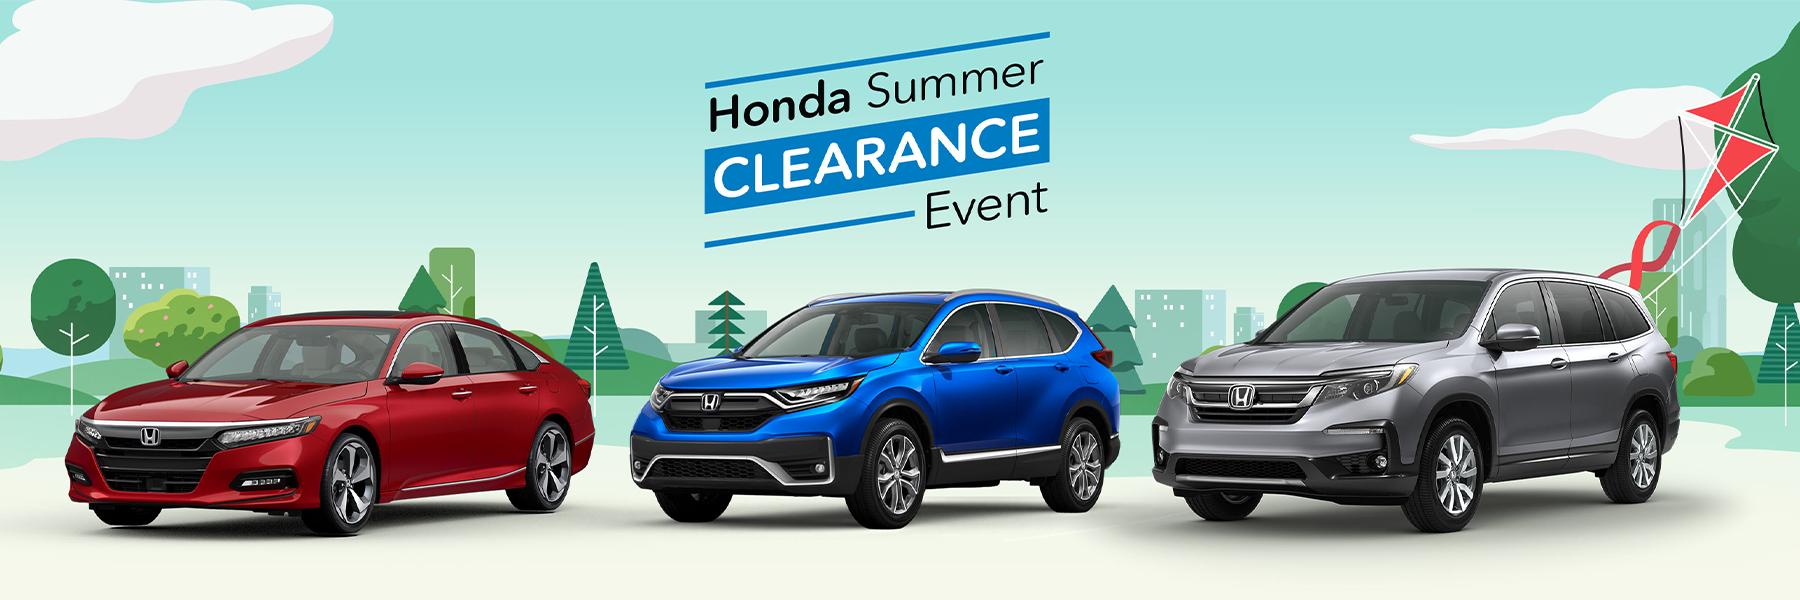 Summer Honda Clearance Event 2020